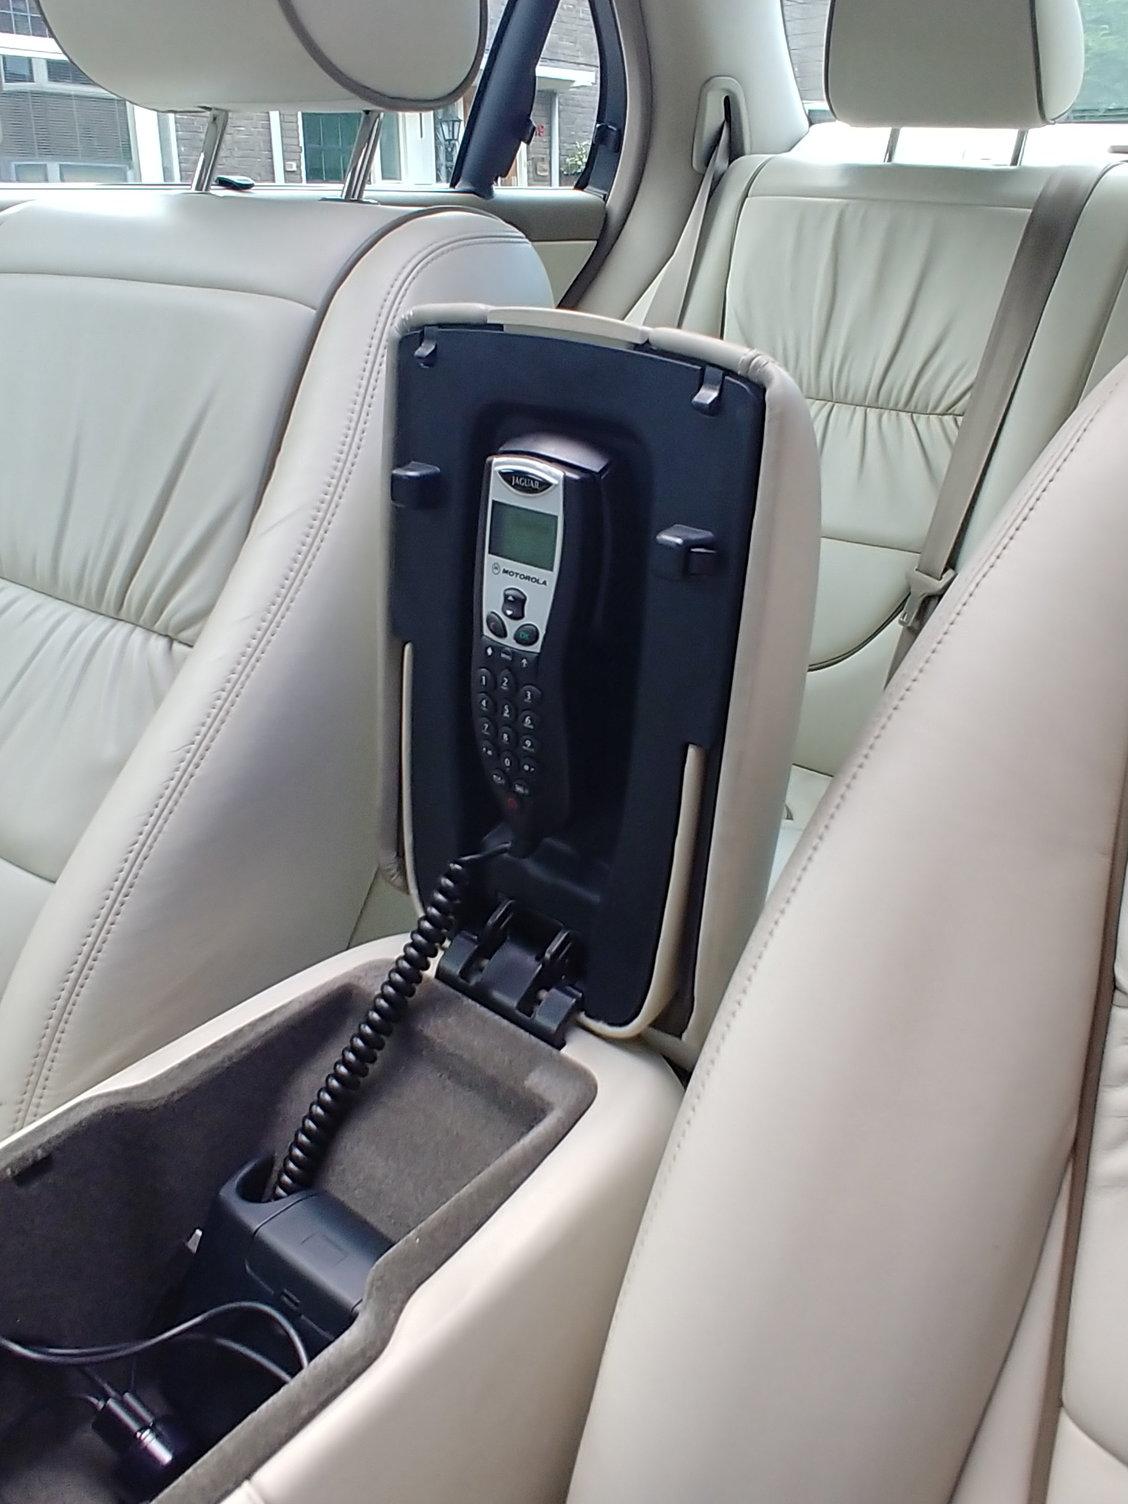 User manual Motorola carphone? - Jaguar Forums - Jaguar